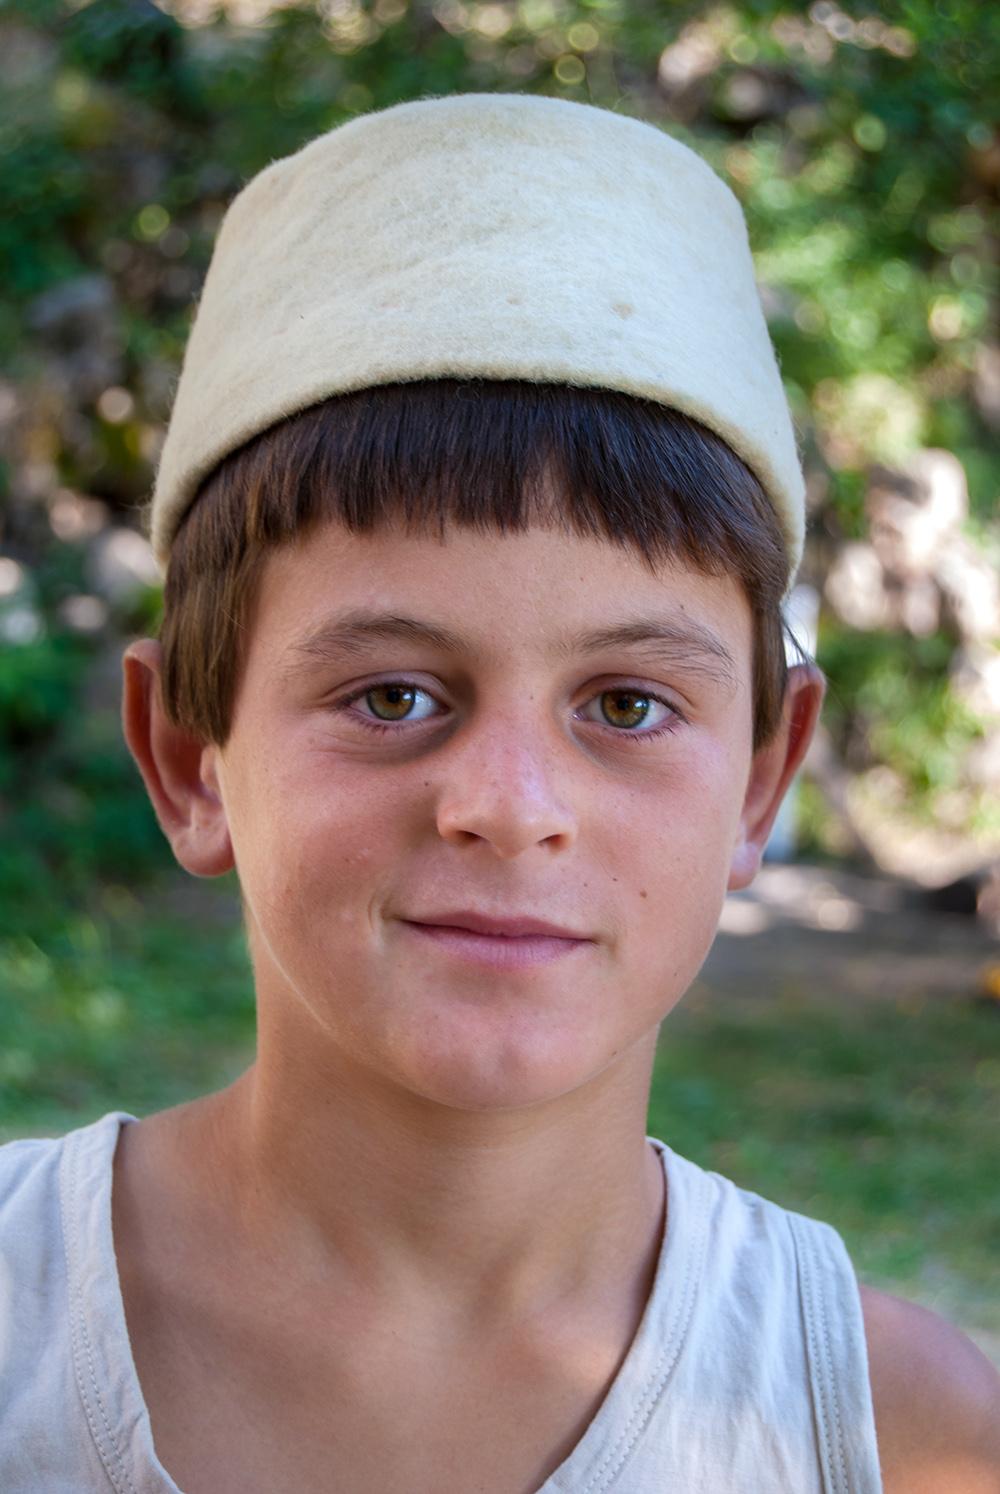 Portrait of a Boy in traditional costume, Orosh Mirditë, © alketa misja photography 2008